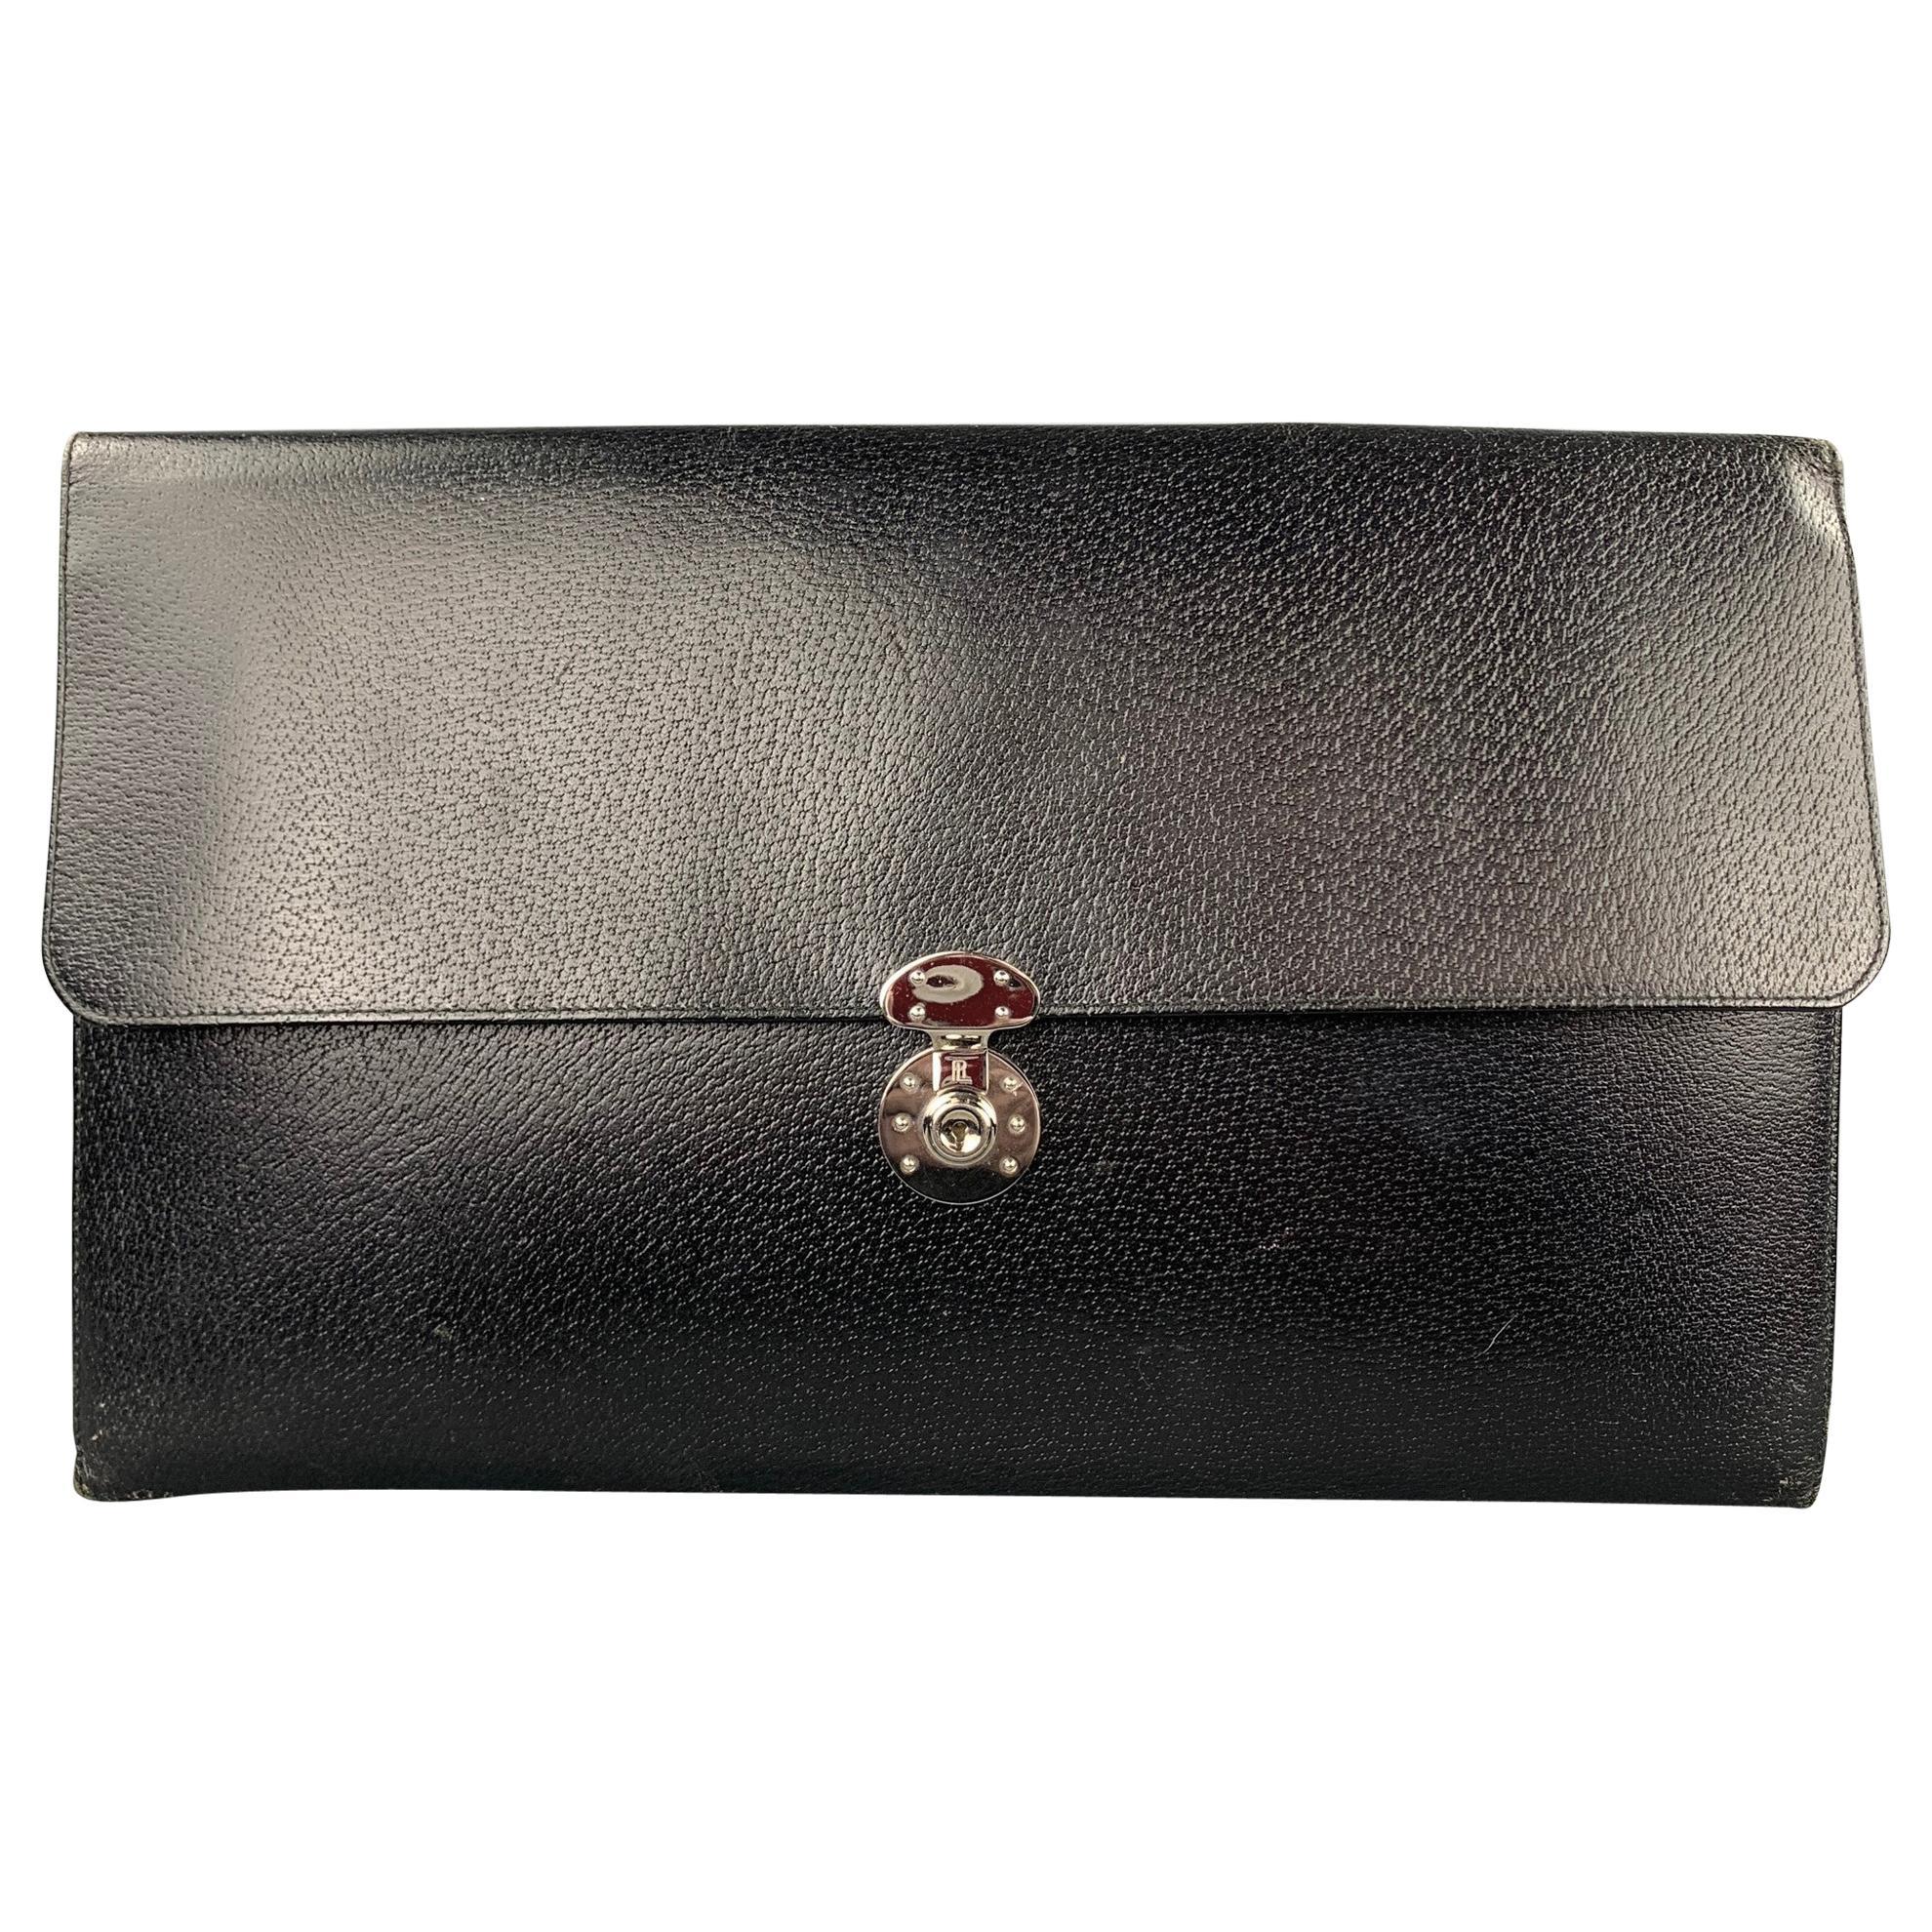 RALPH LAUREN Black Leather Pigskin Rectangle Briefcase Bag